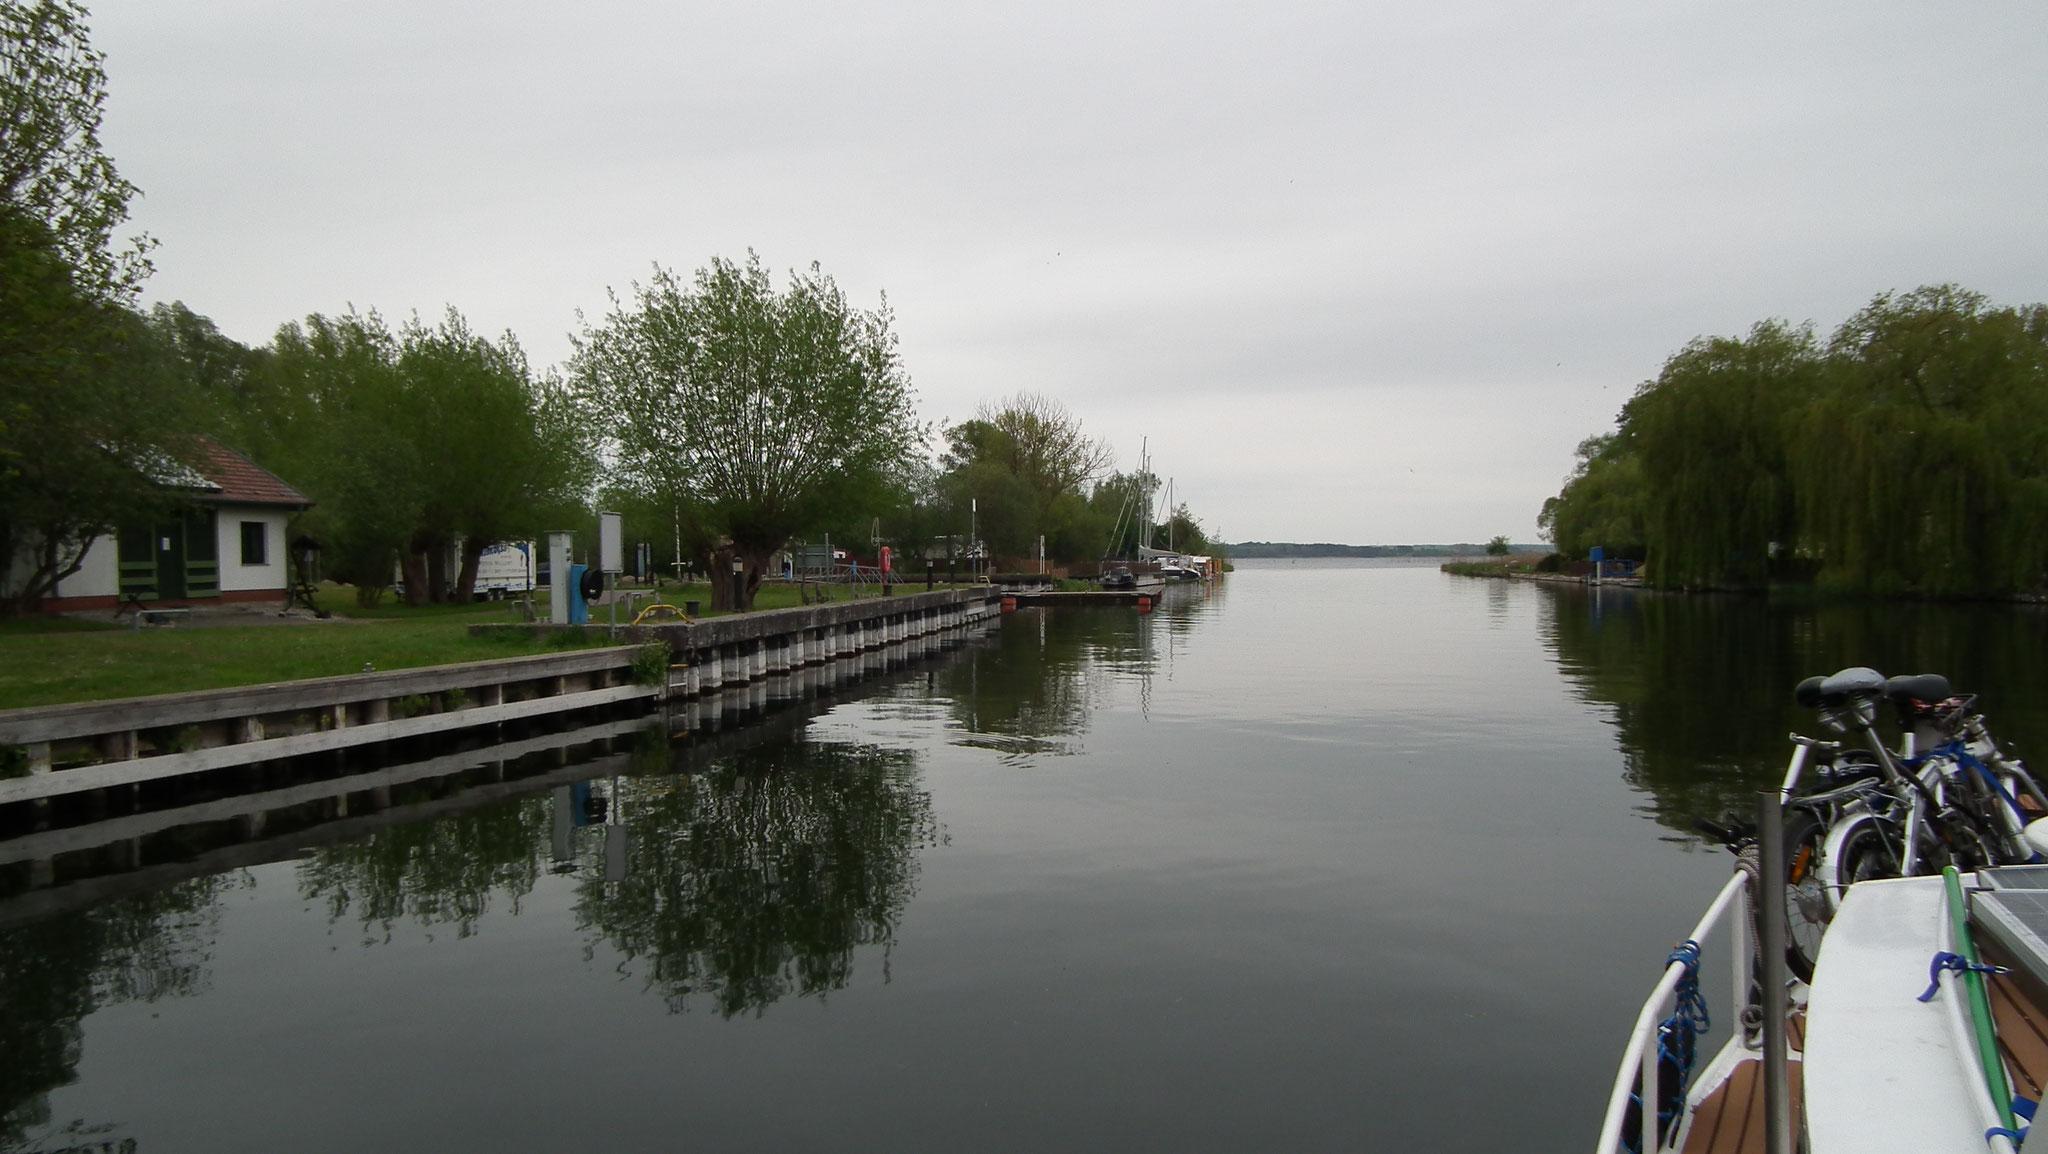 Aalbude / Verchen an der Peene - kurz vor dem Kummerower See